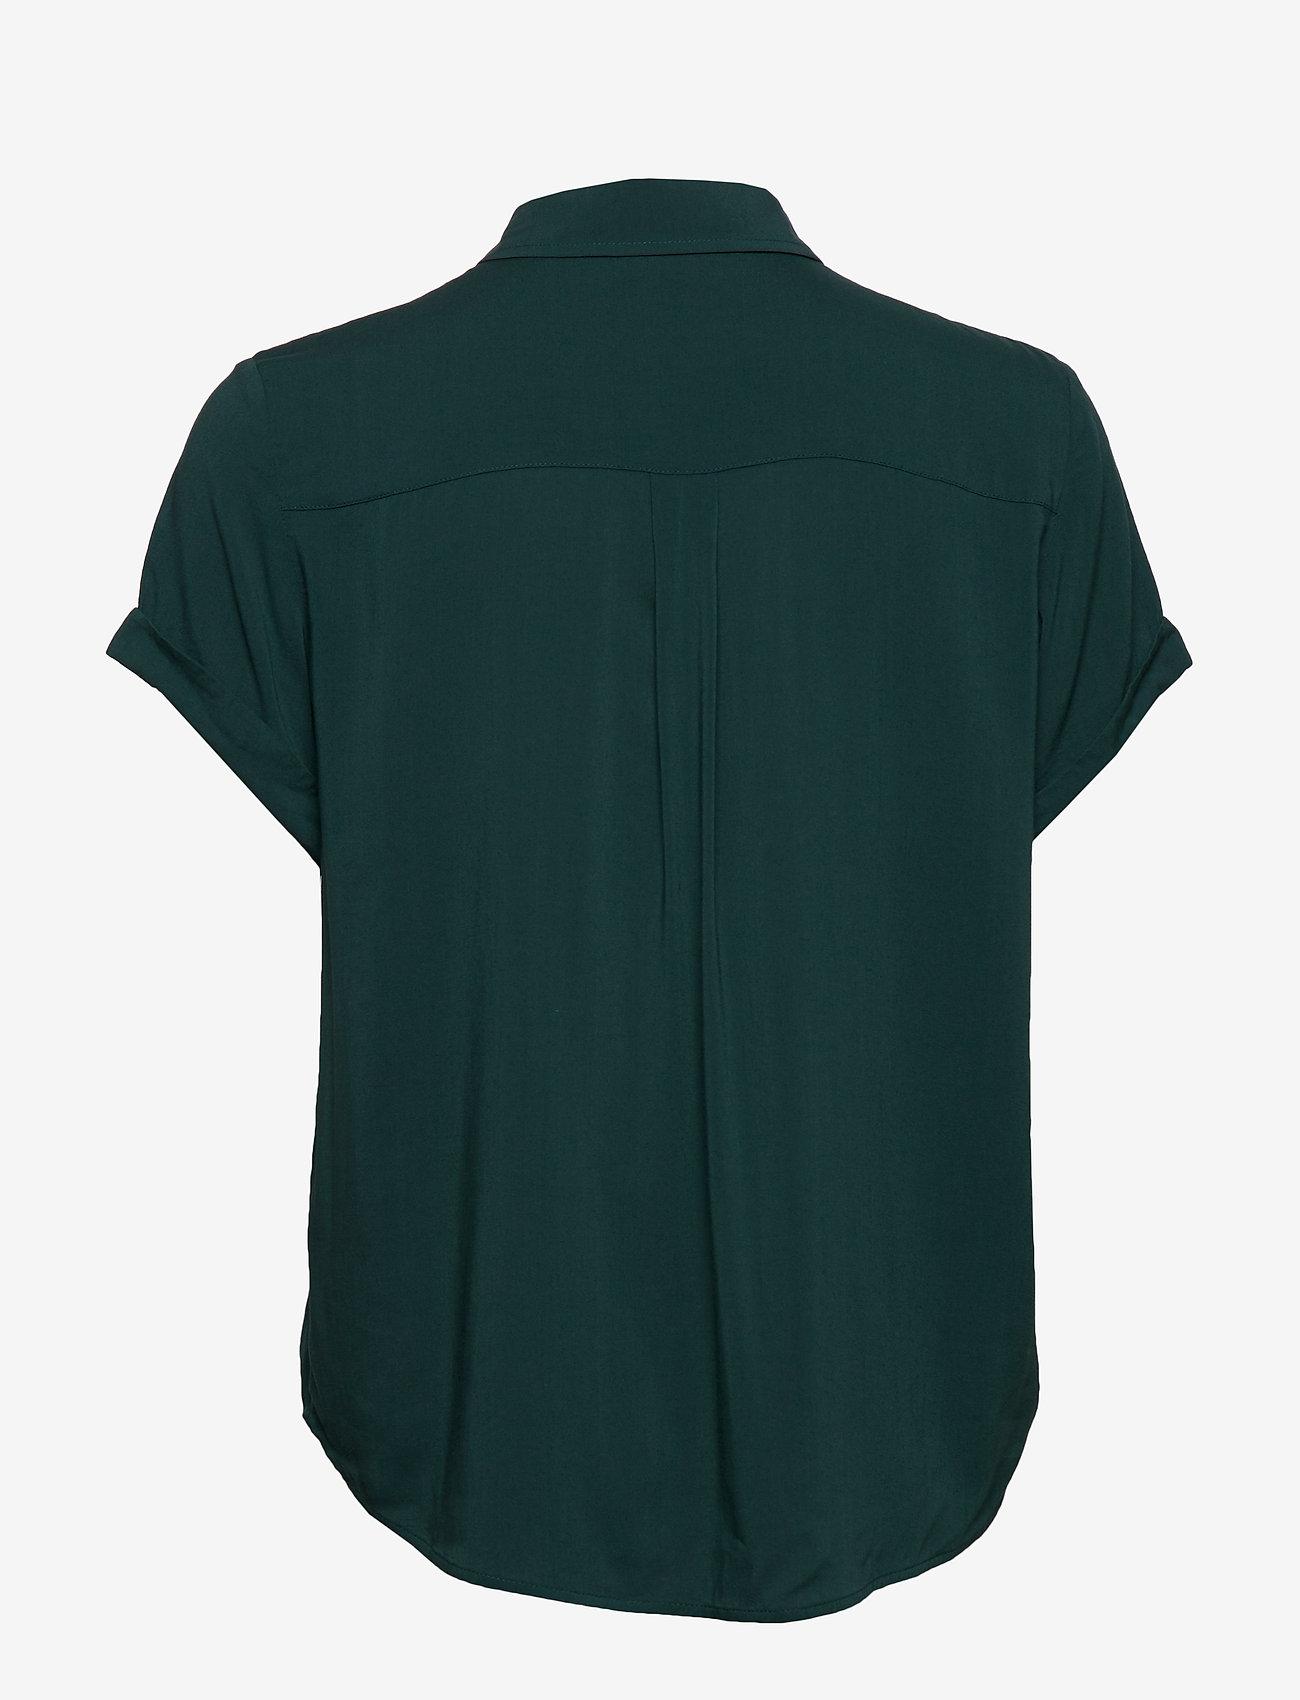 Samsøe Samsøe - Majan ss shirt 9942 - overhemden met korte mouwen - sea moss - 1